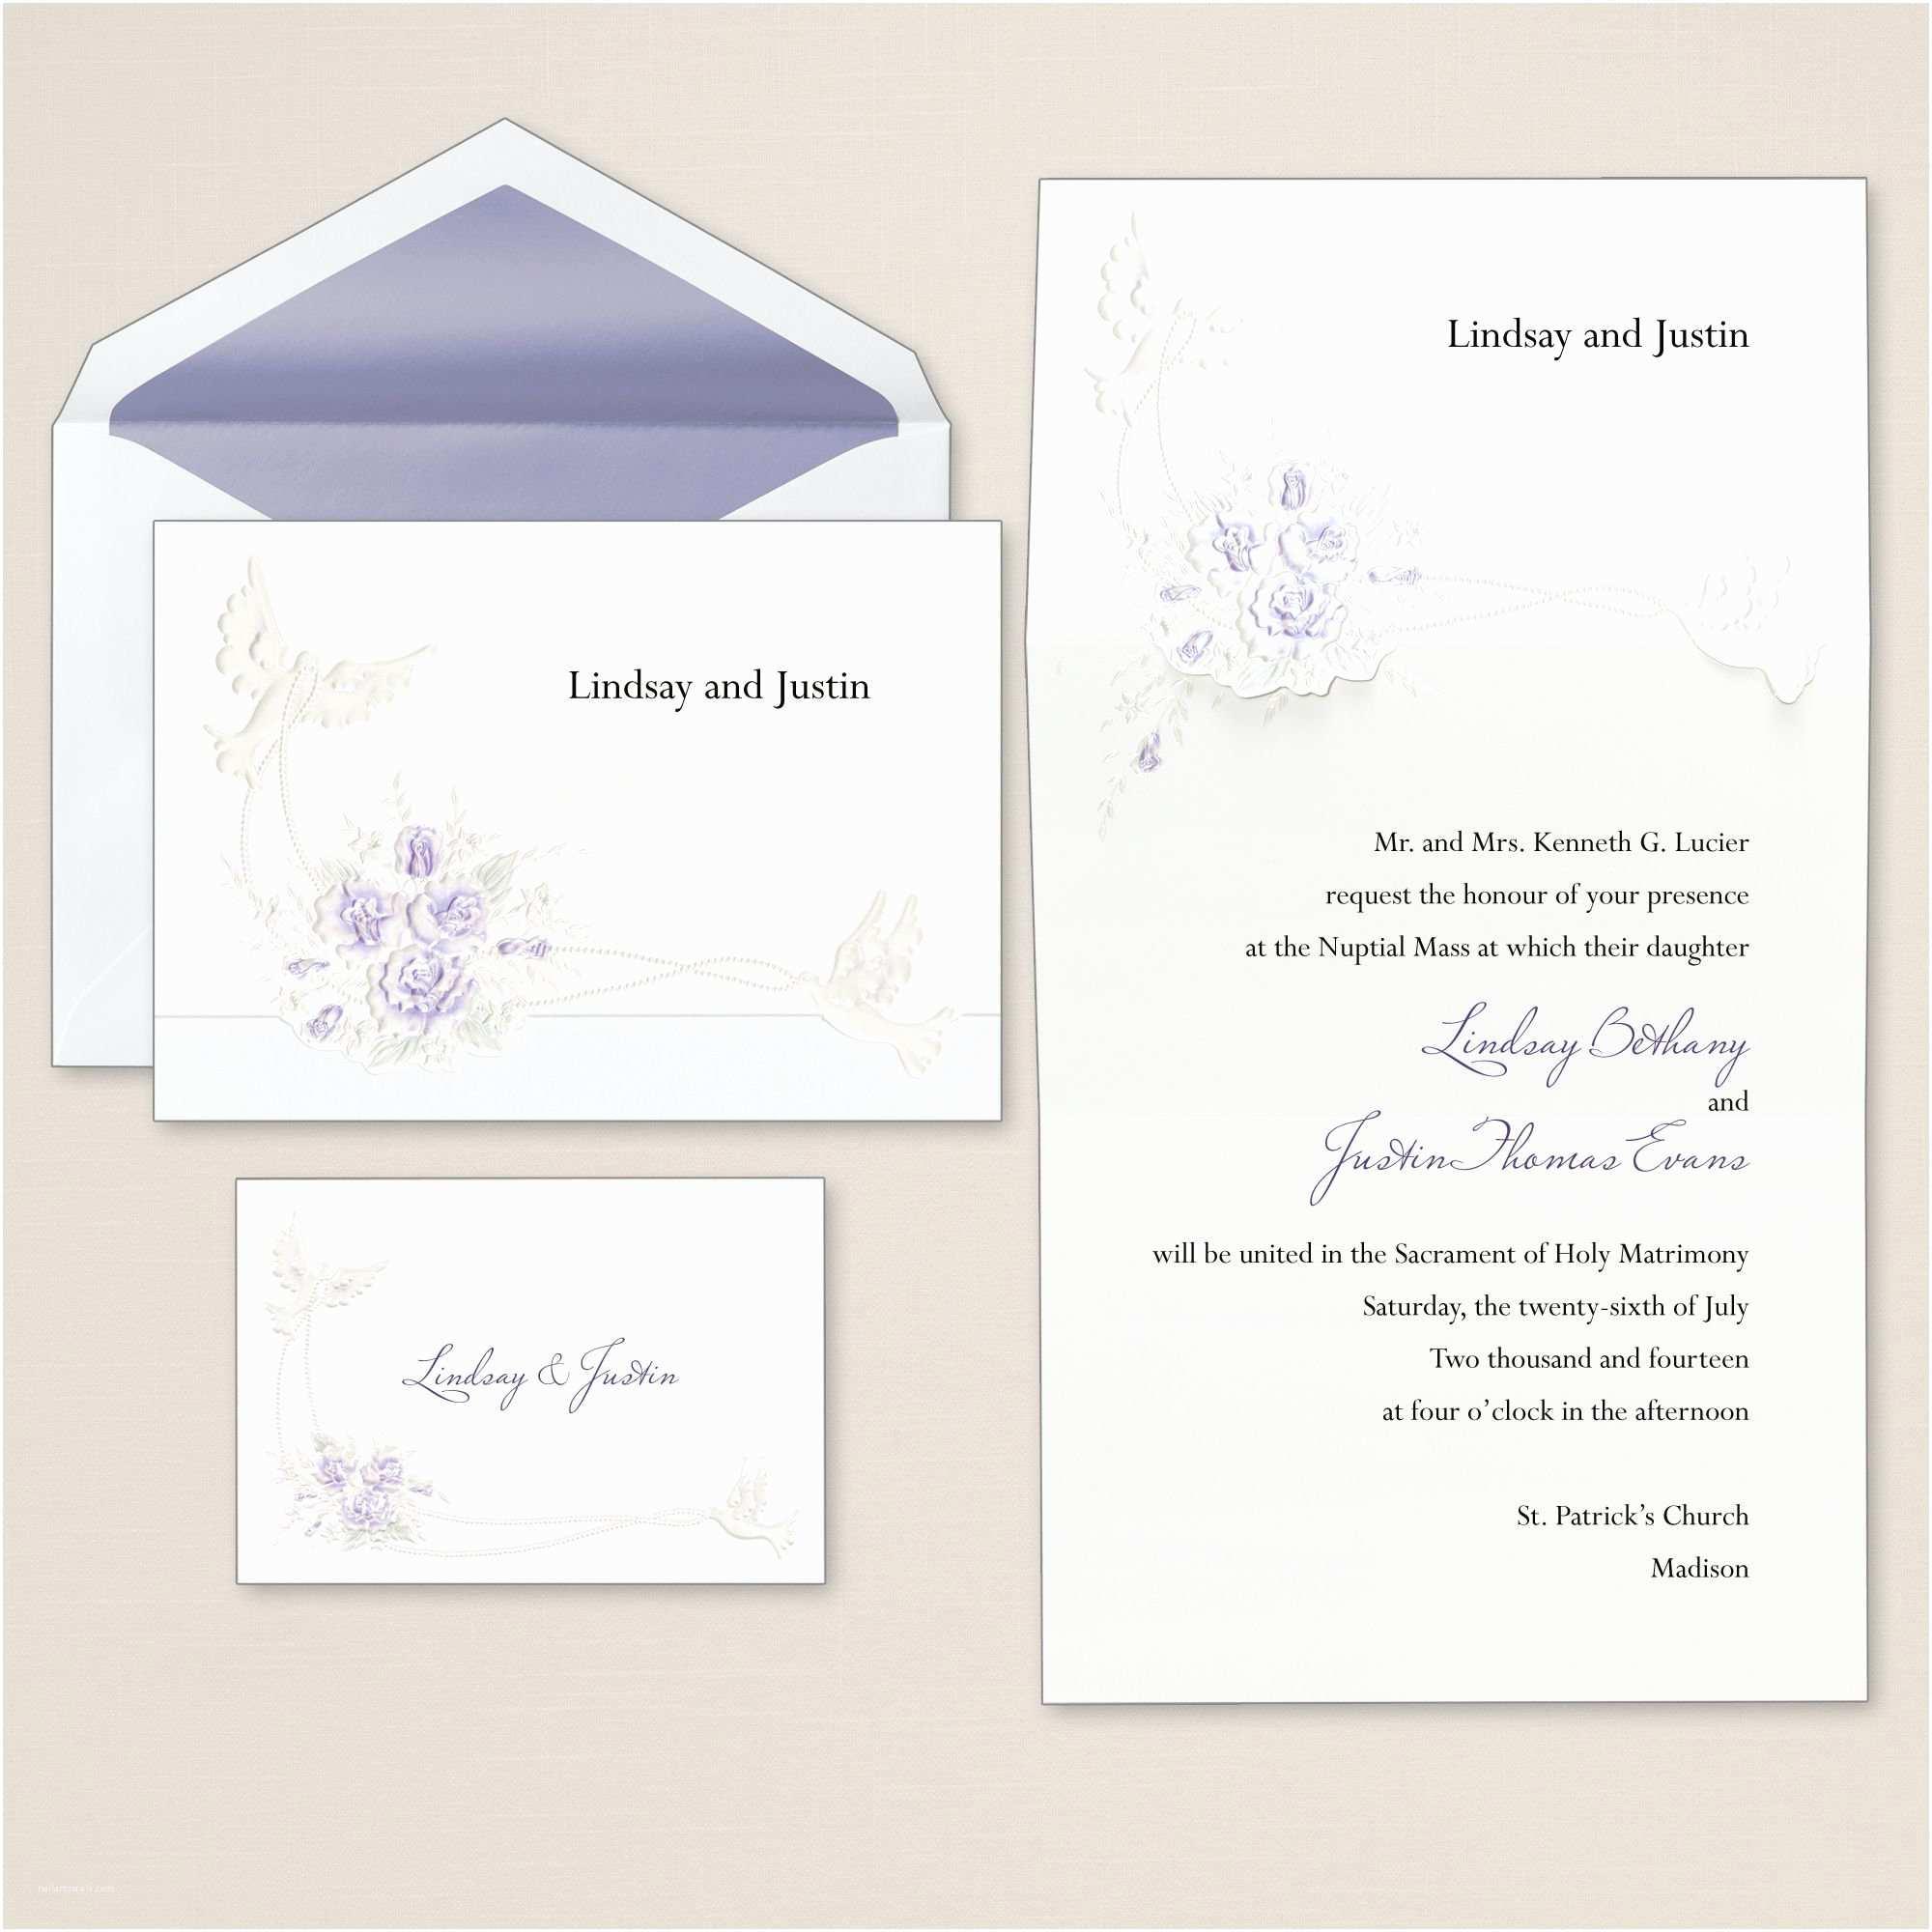 Wedding Invitations with Rsvp Cards Wedding Invitation Wedding Invitations Reply Cards New